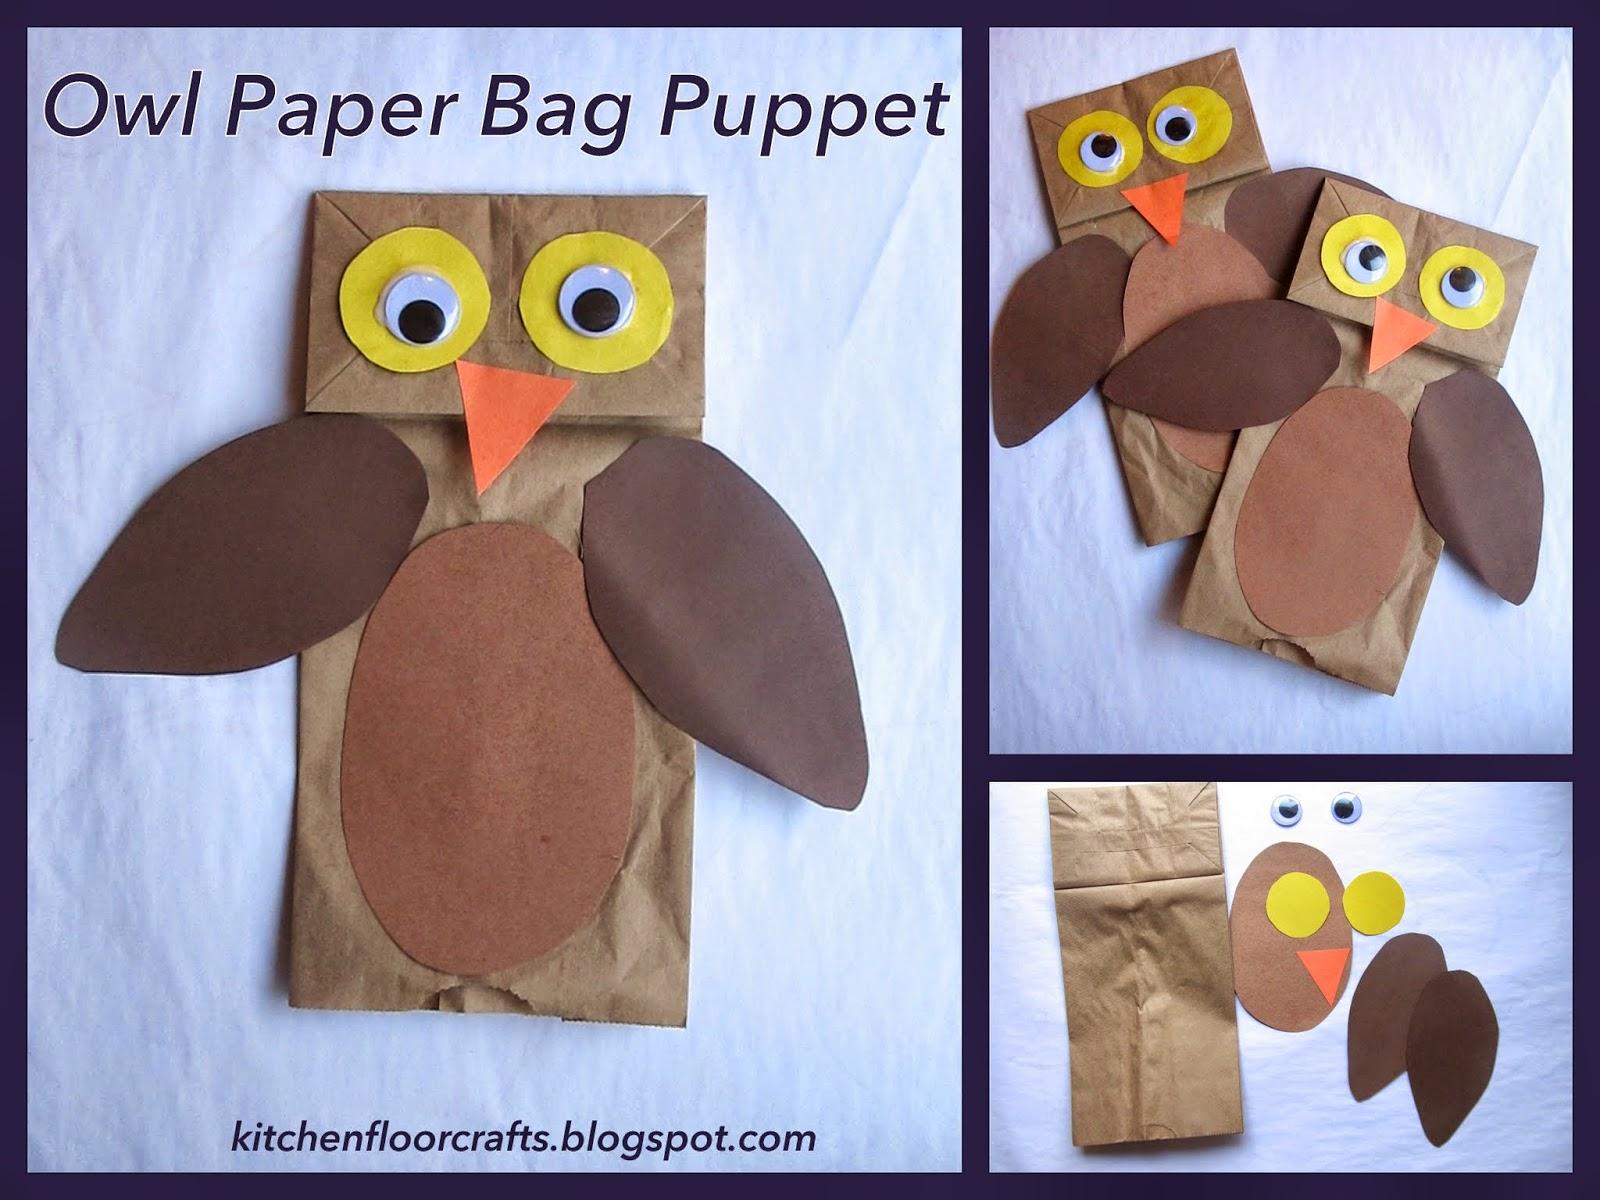 Kitchen floor crafts owl paper bag puppets owl paper bag puppets jeuxipadfo Choice Image